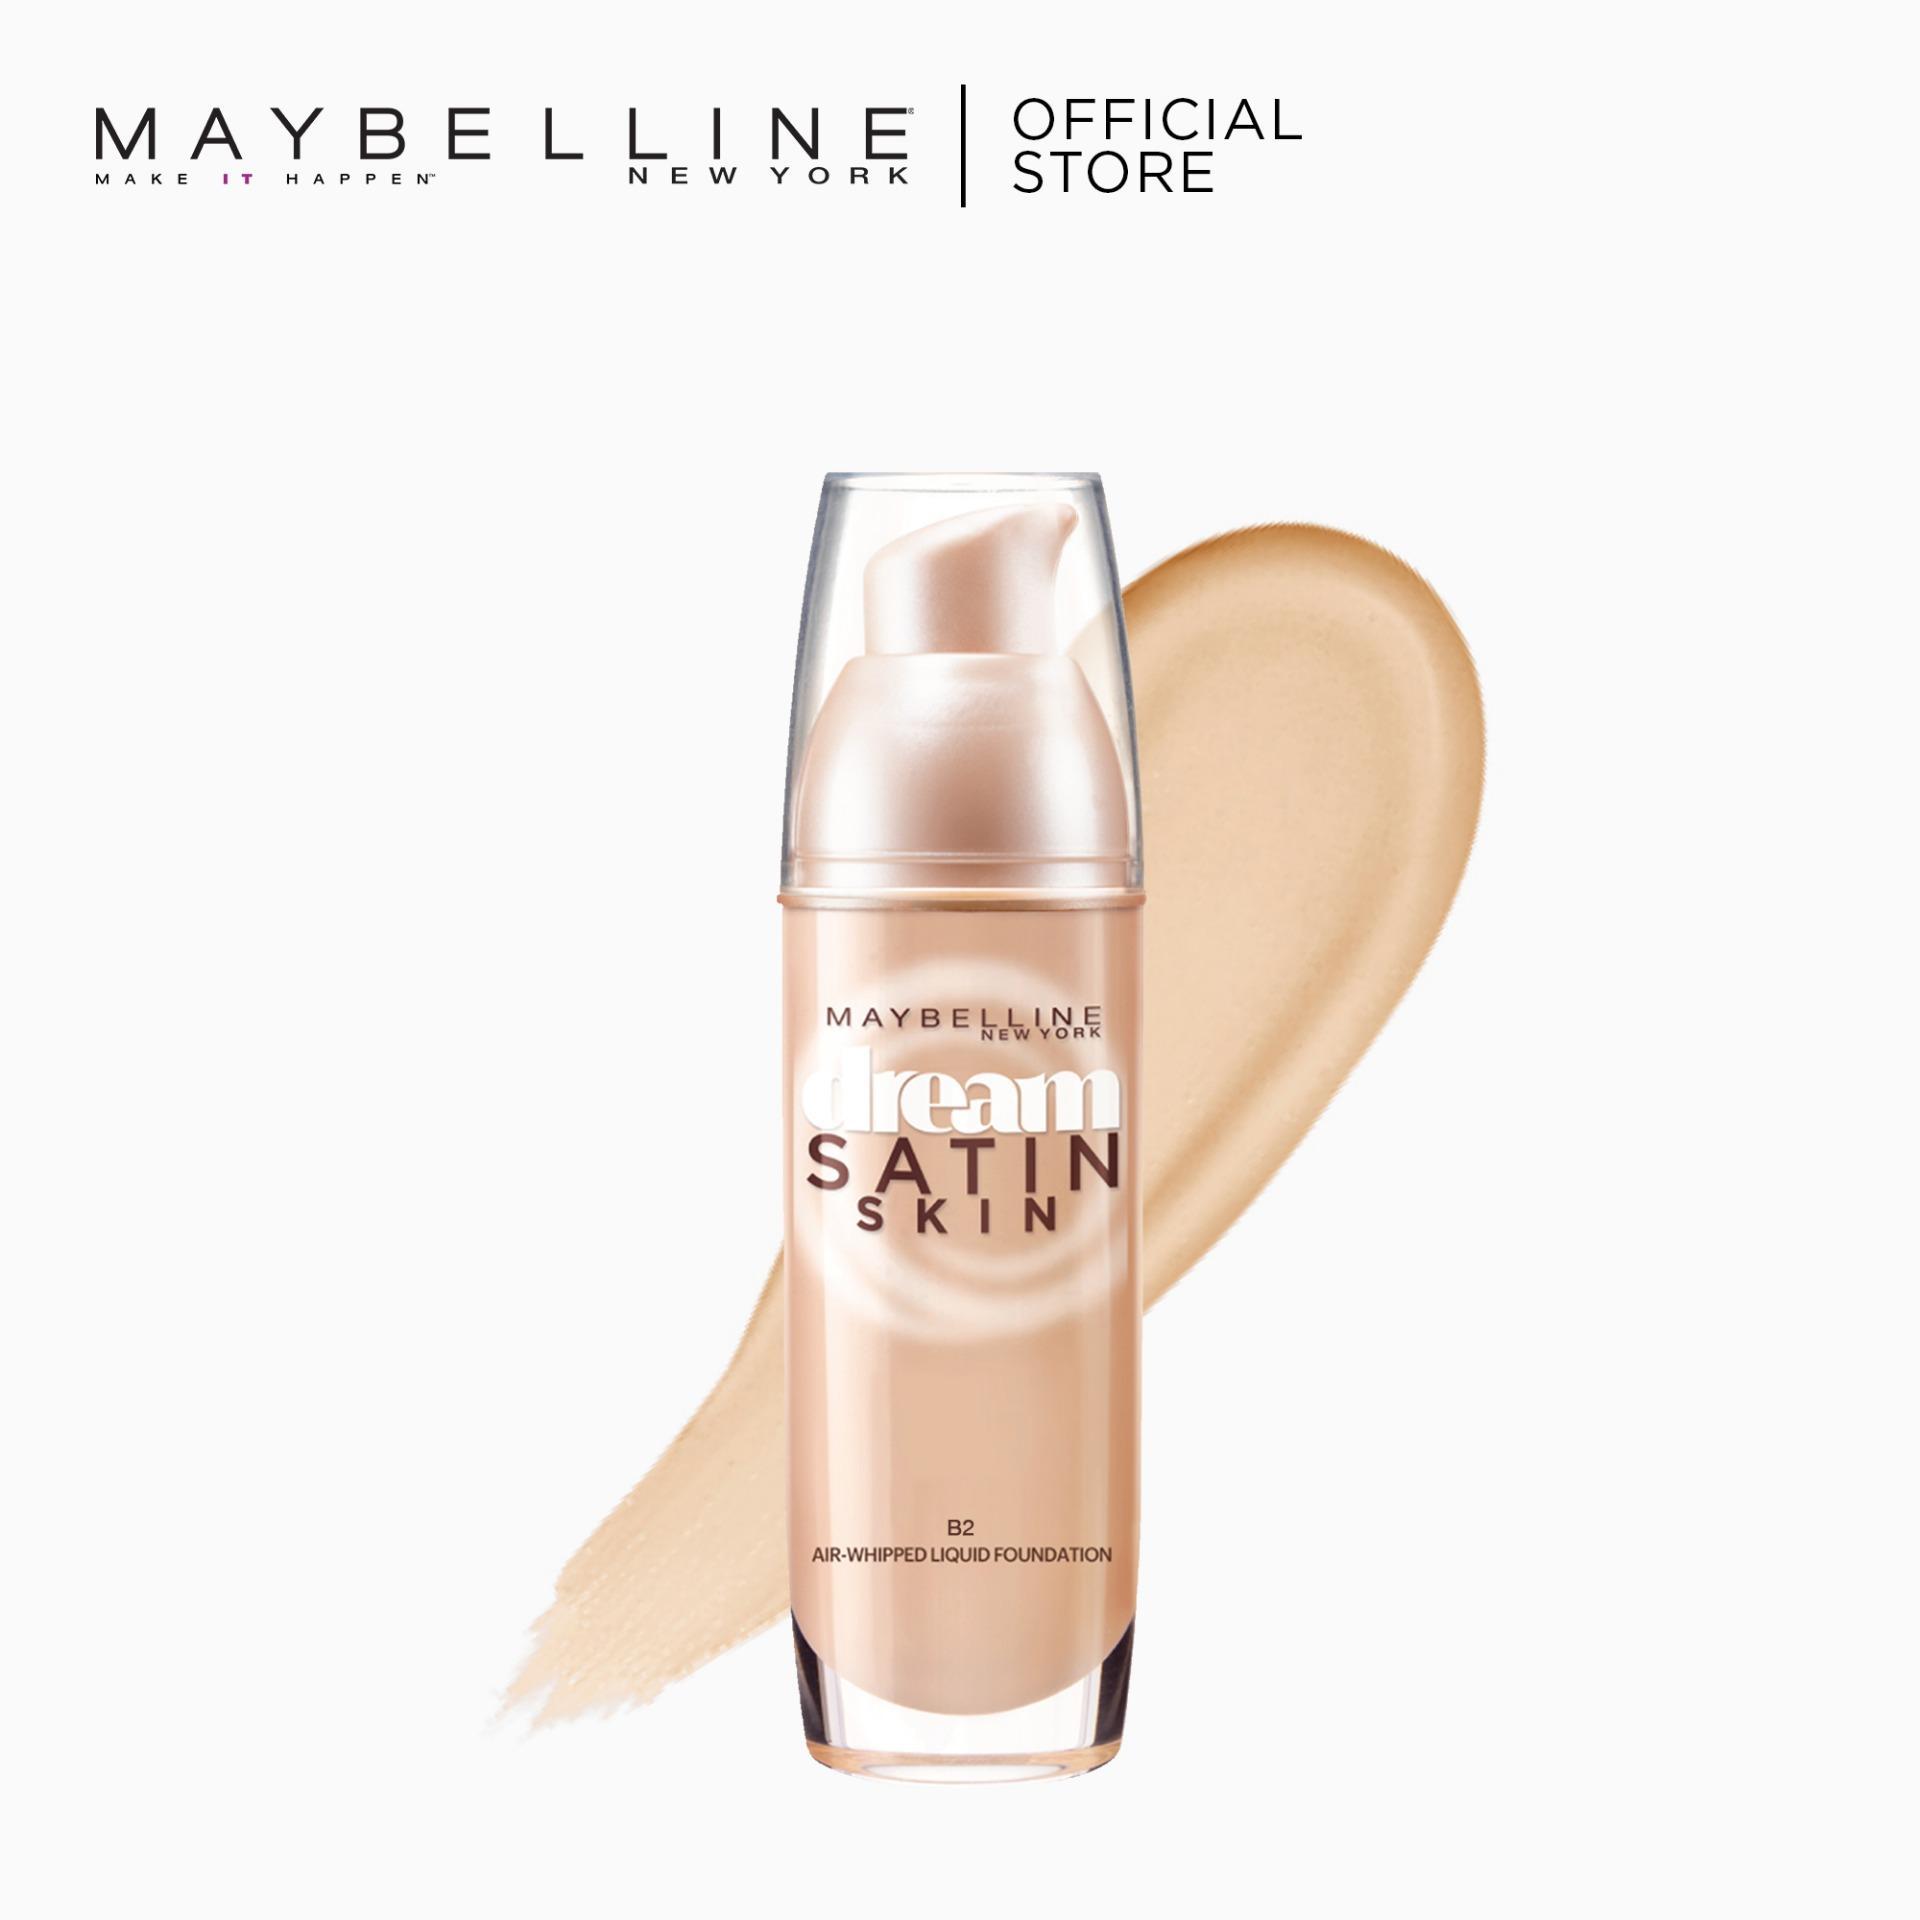 Maybelline Dream Satin Skin Liquid Foundation 30 mL - B2 Philippines